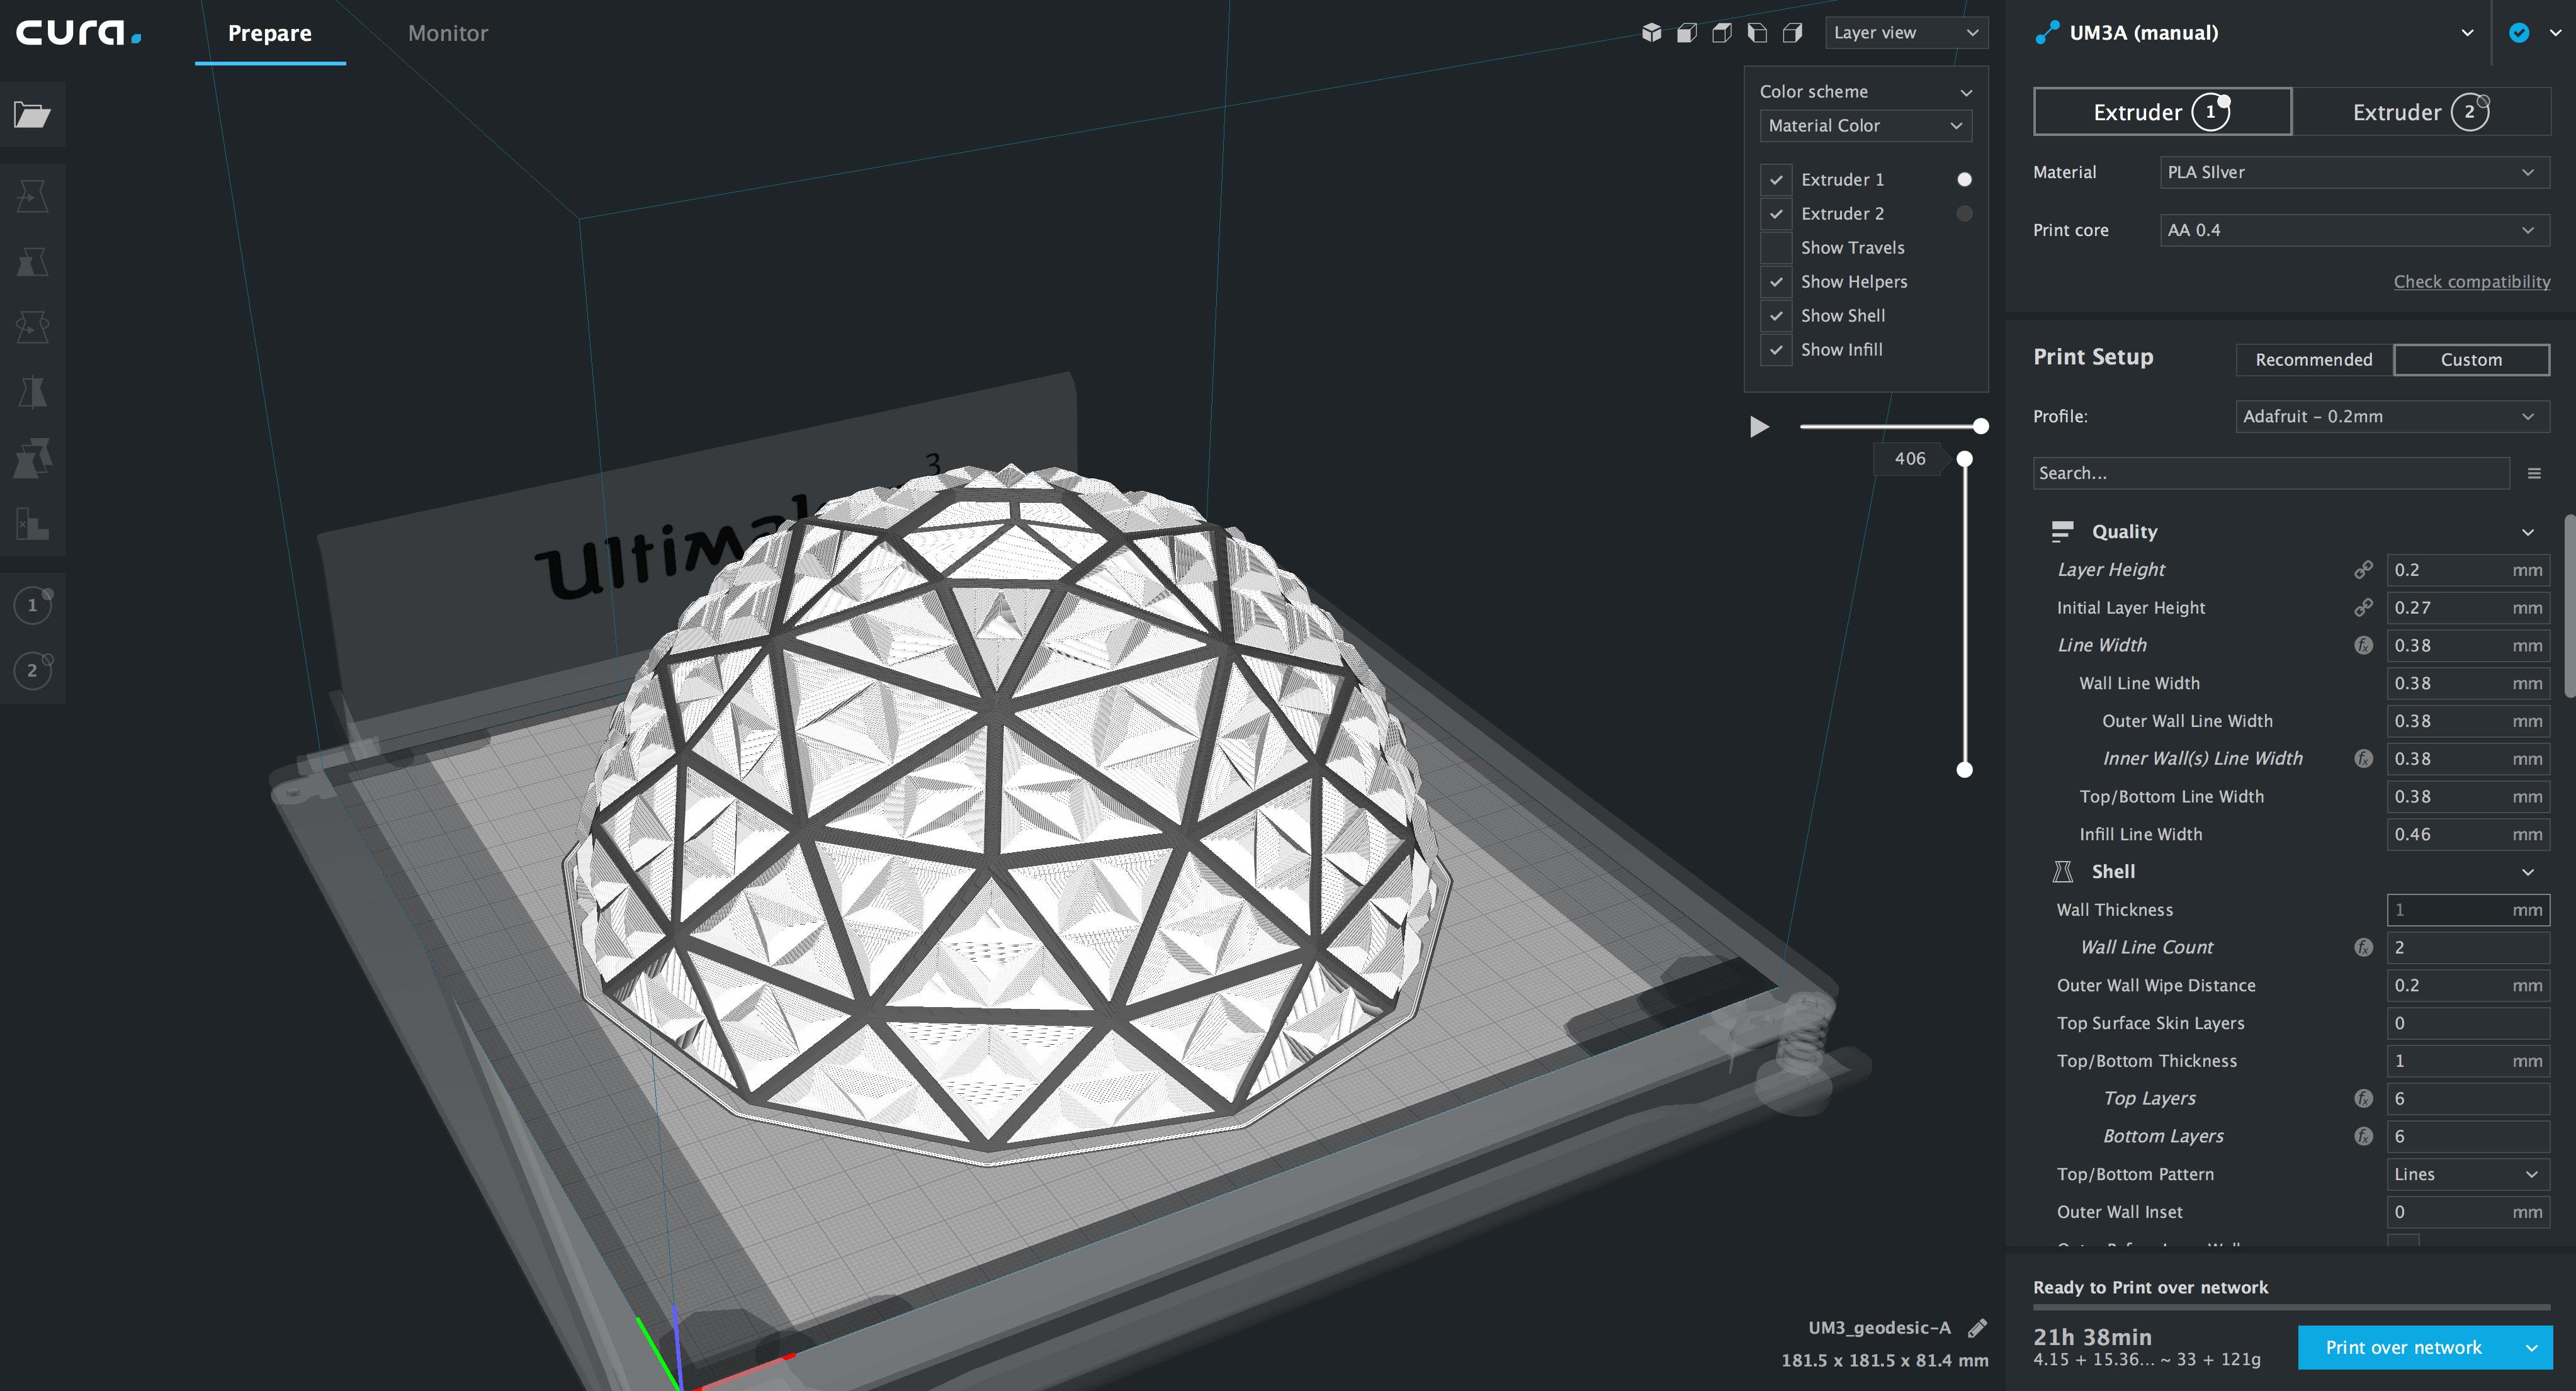 3d_printing_dome-slice-cura.jpg